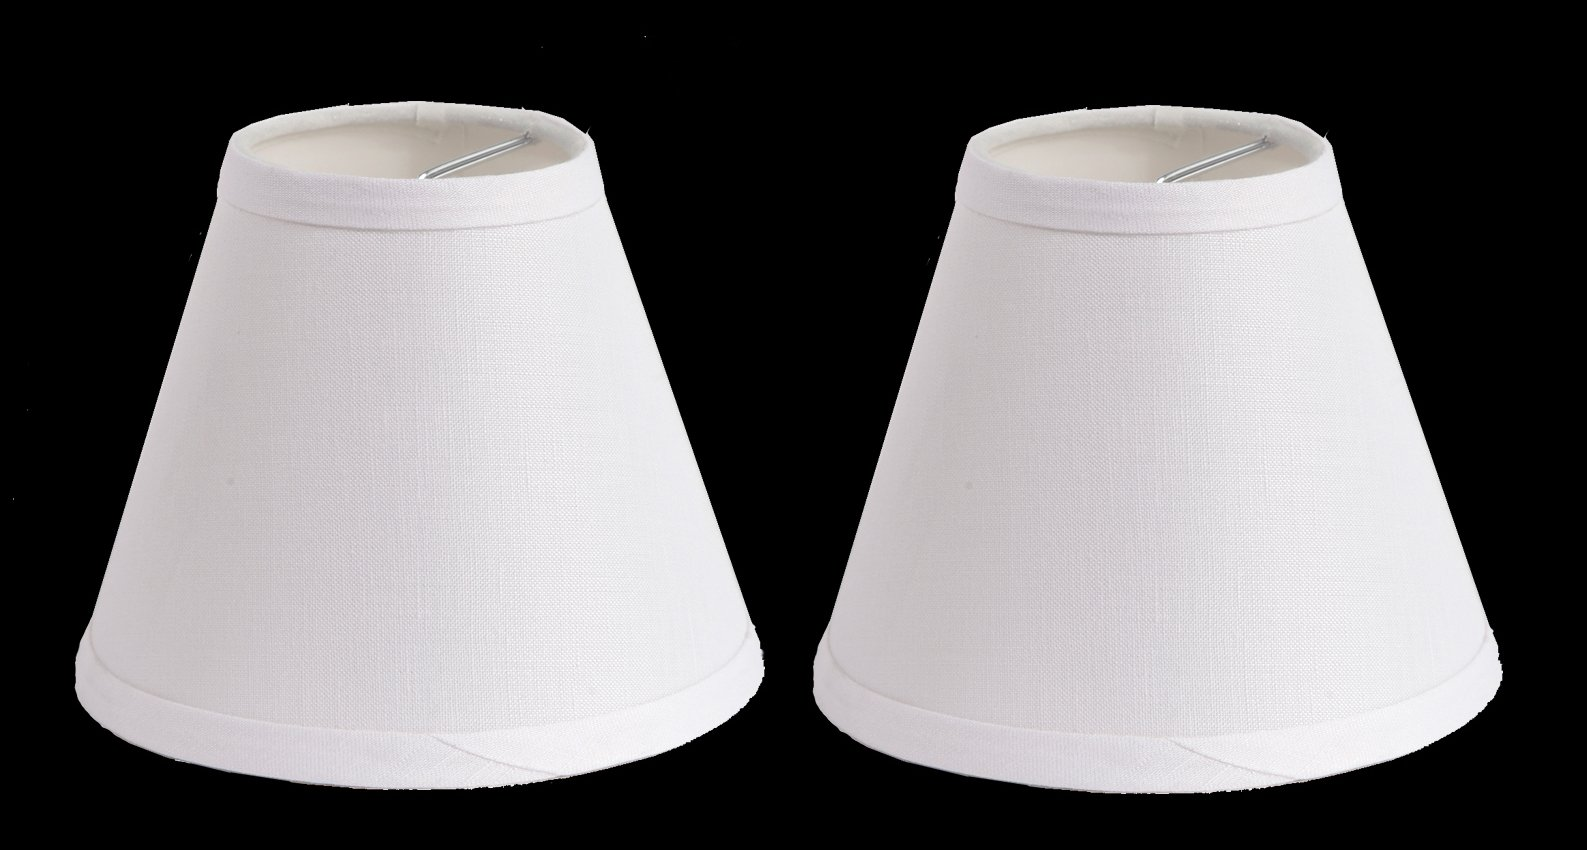 Urbanest 100% Linen Chandelier Lamp Shades, 6-inch, Hardback Clip On, White(set of 2)